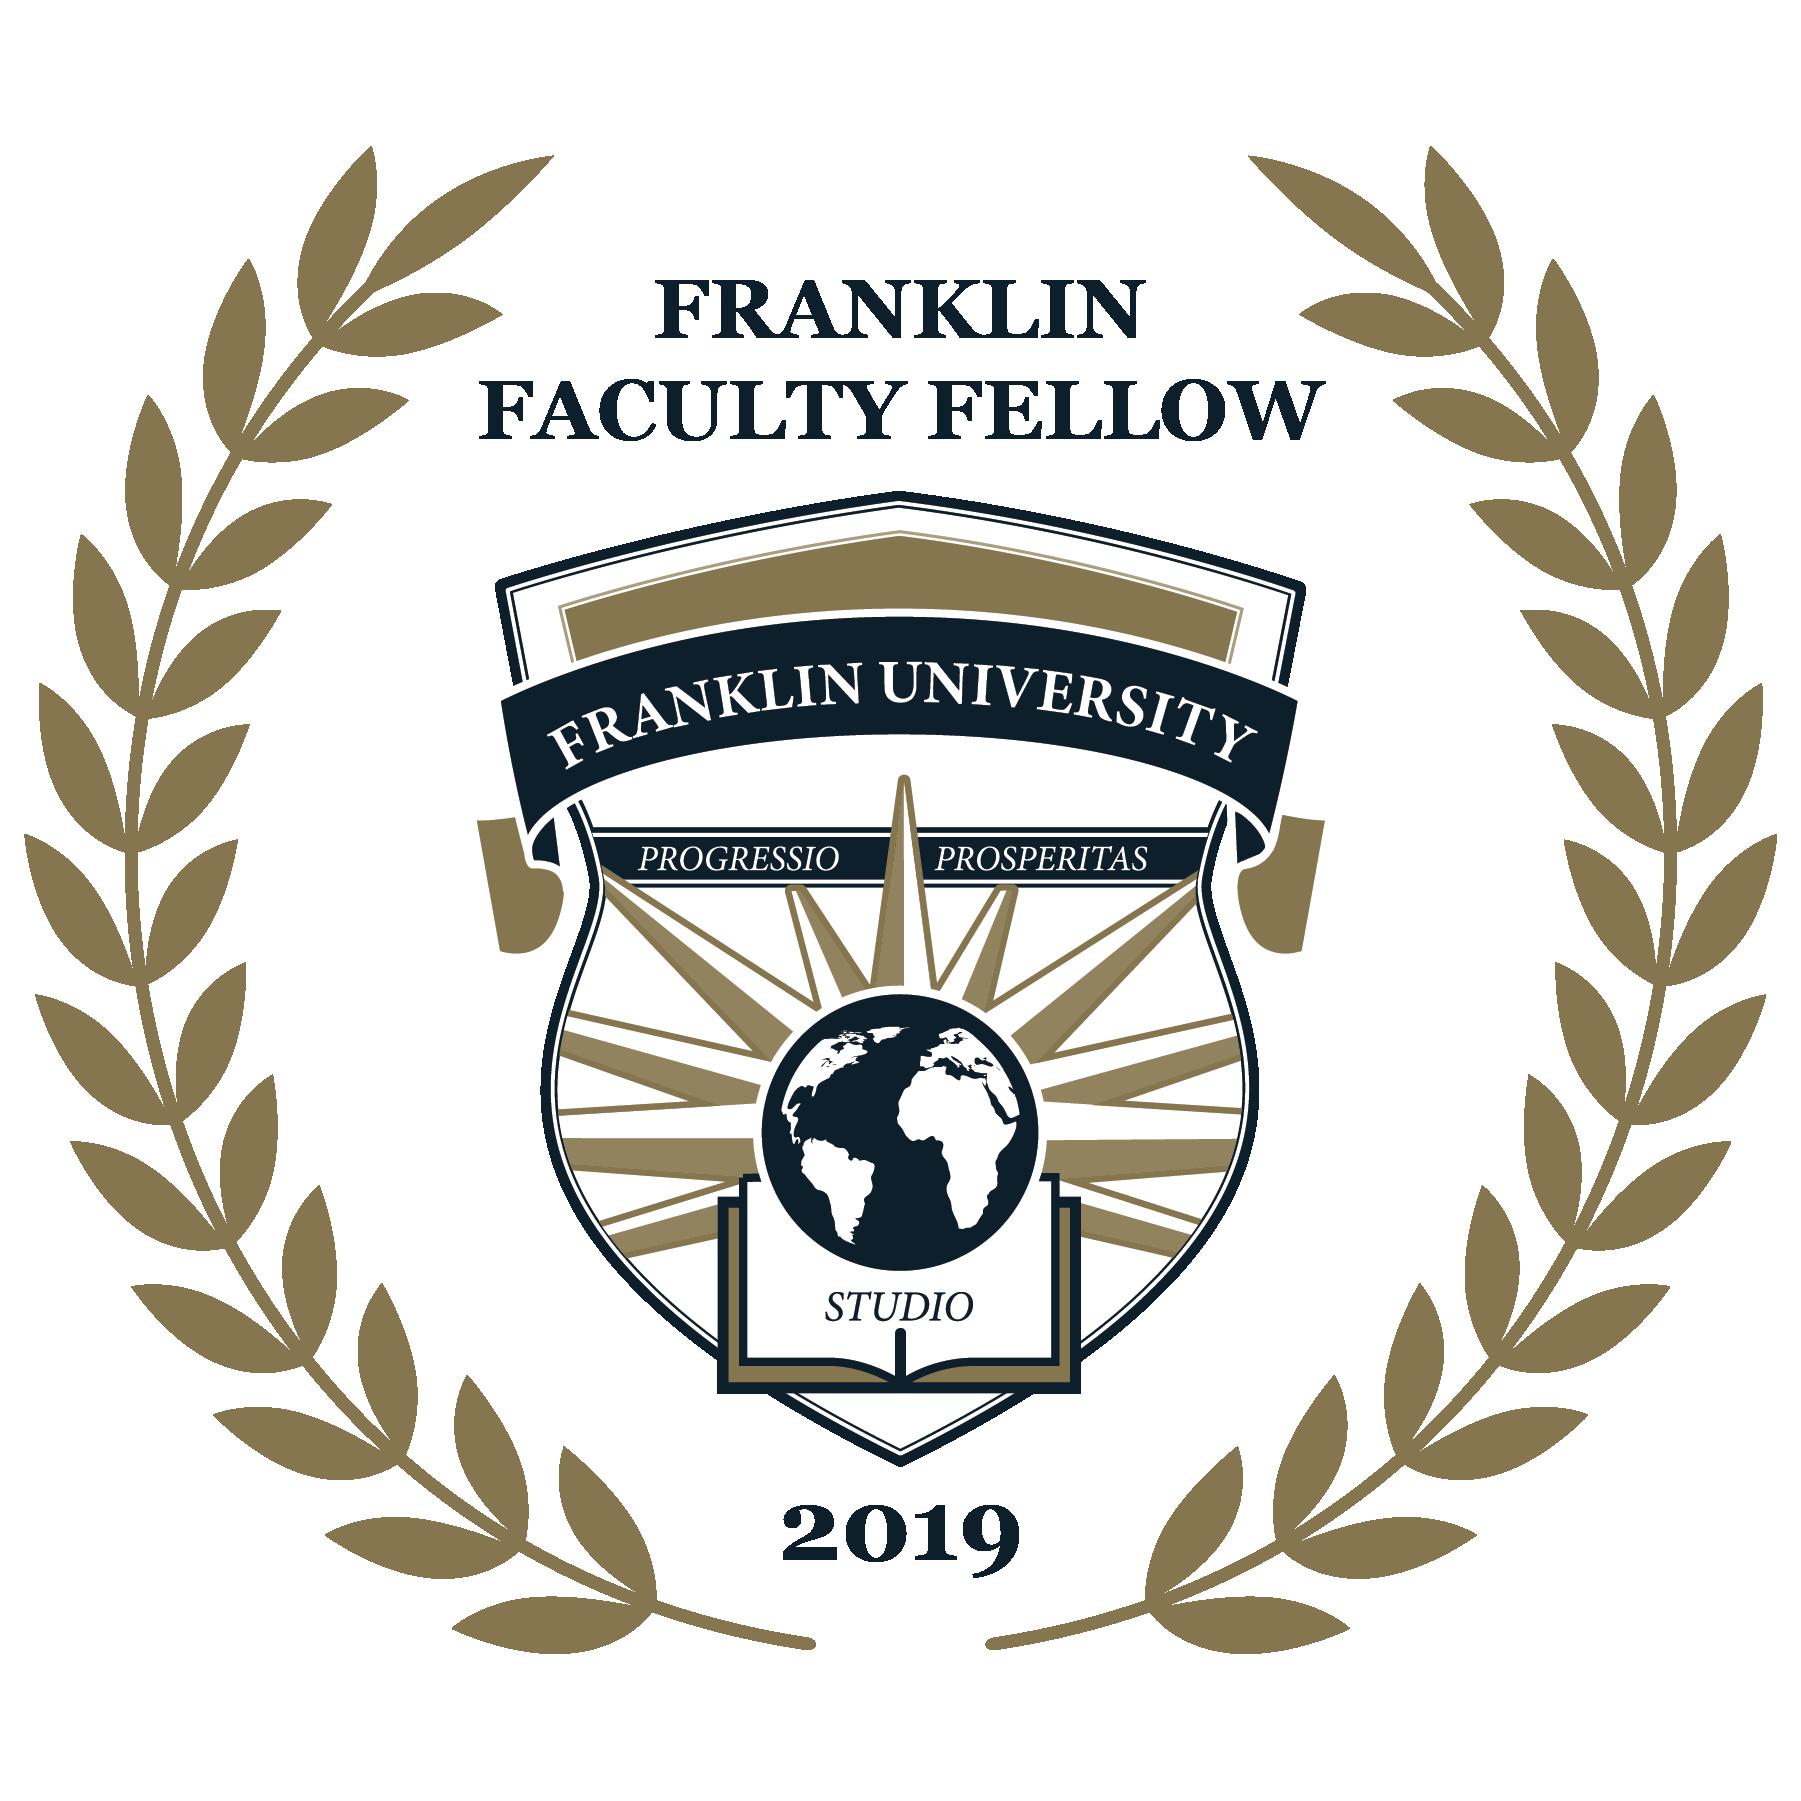 2019 Franklin Faculty Fellow